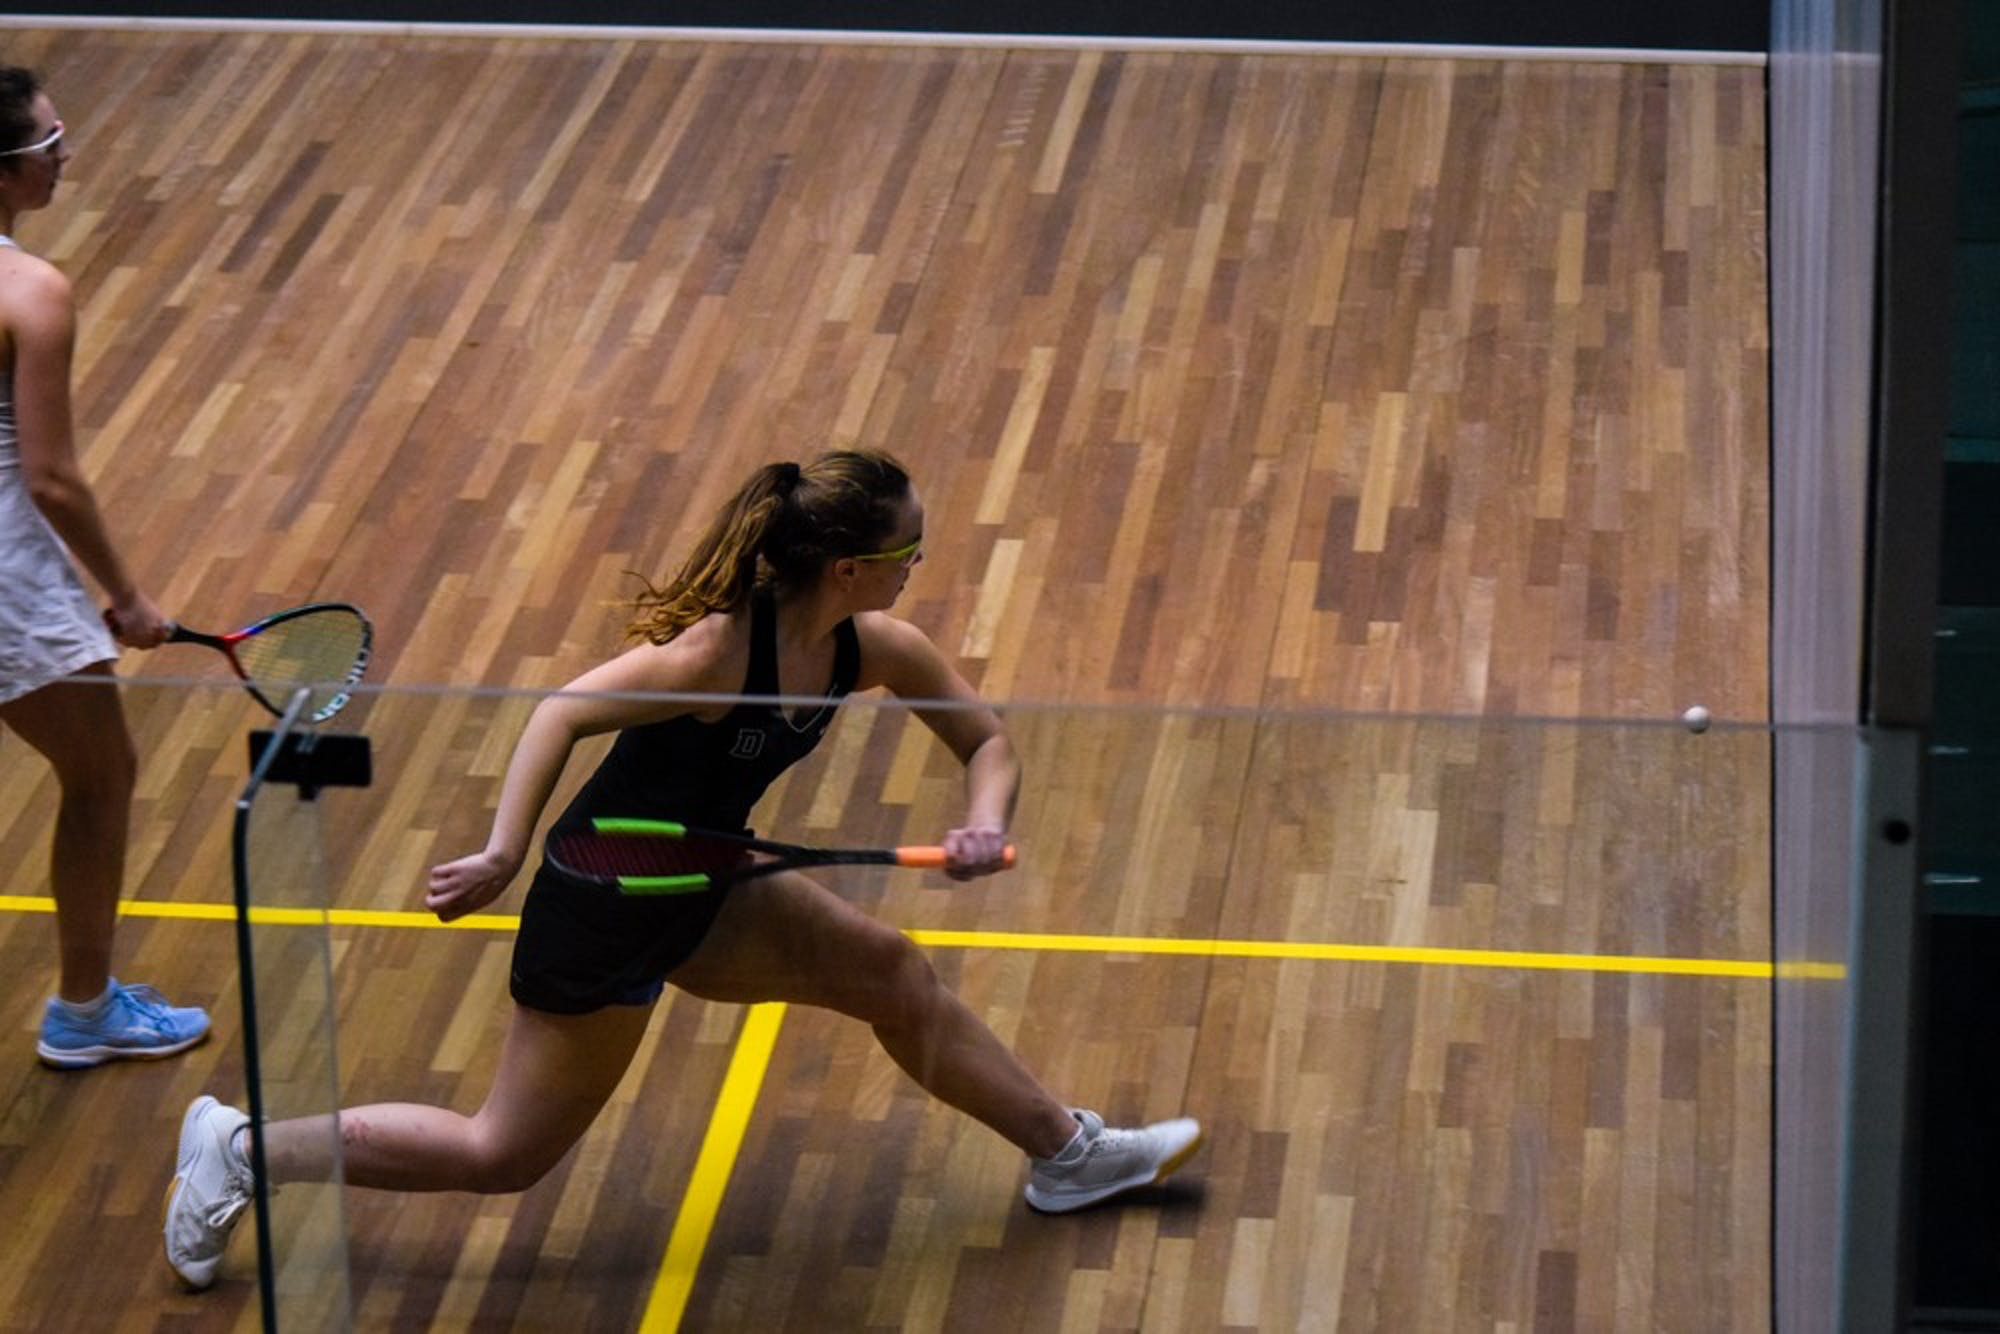 2-10-20-squash2-lorraineliu